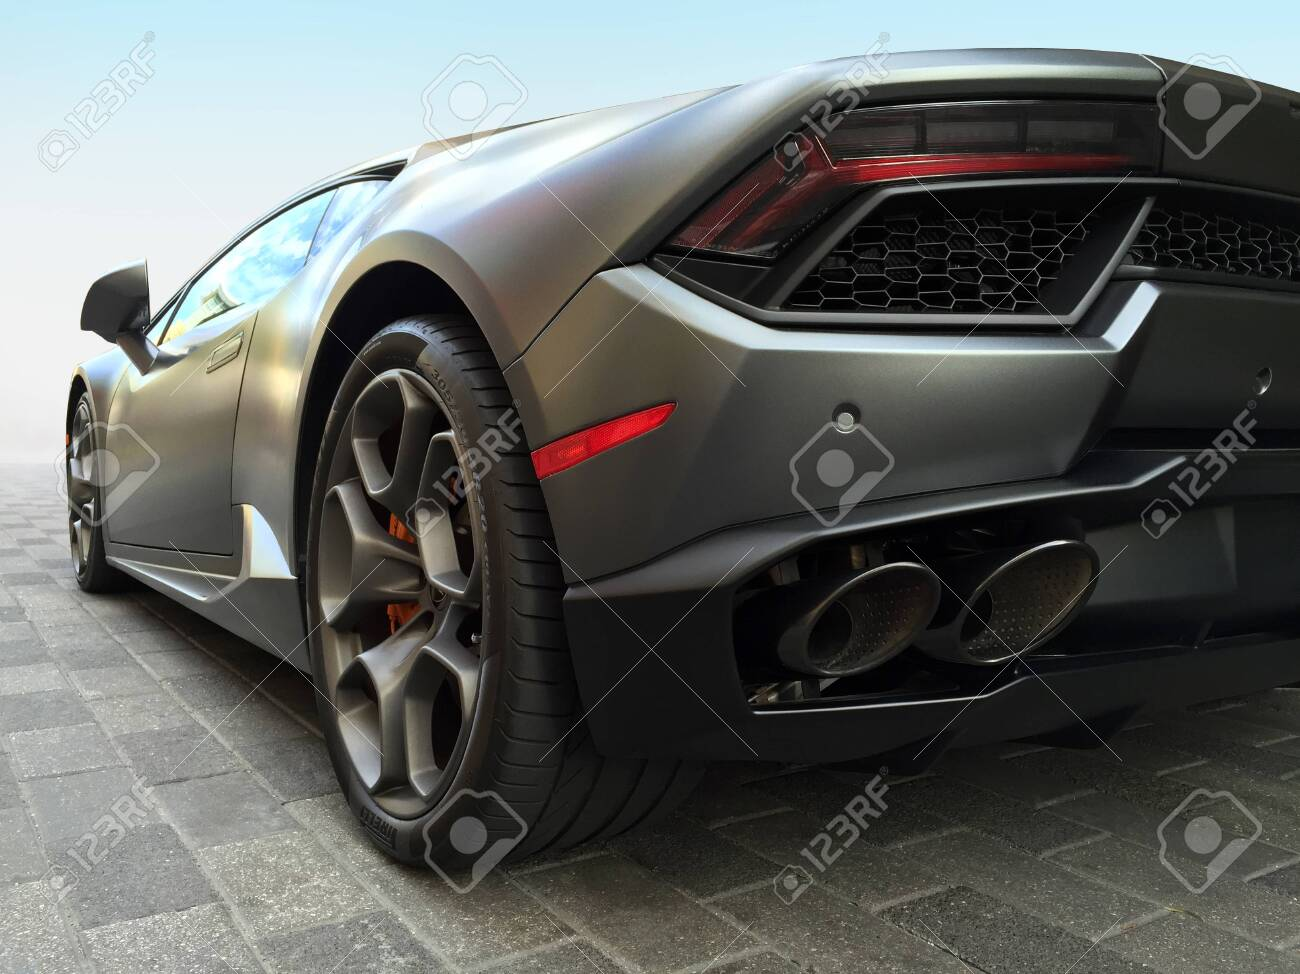 Houston TX, October 9, 2016 A Lamborghini Huracan at the Lamborghini Festival - 141002705